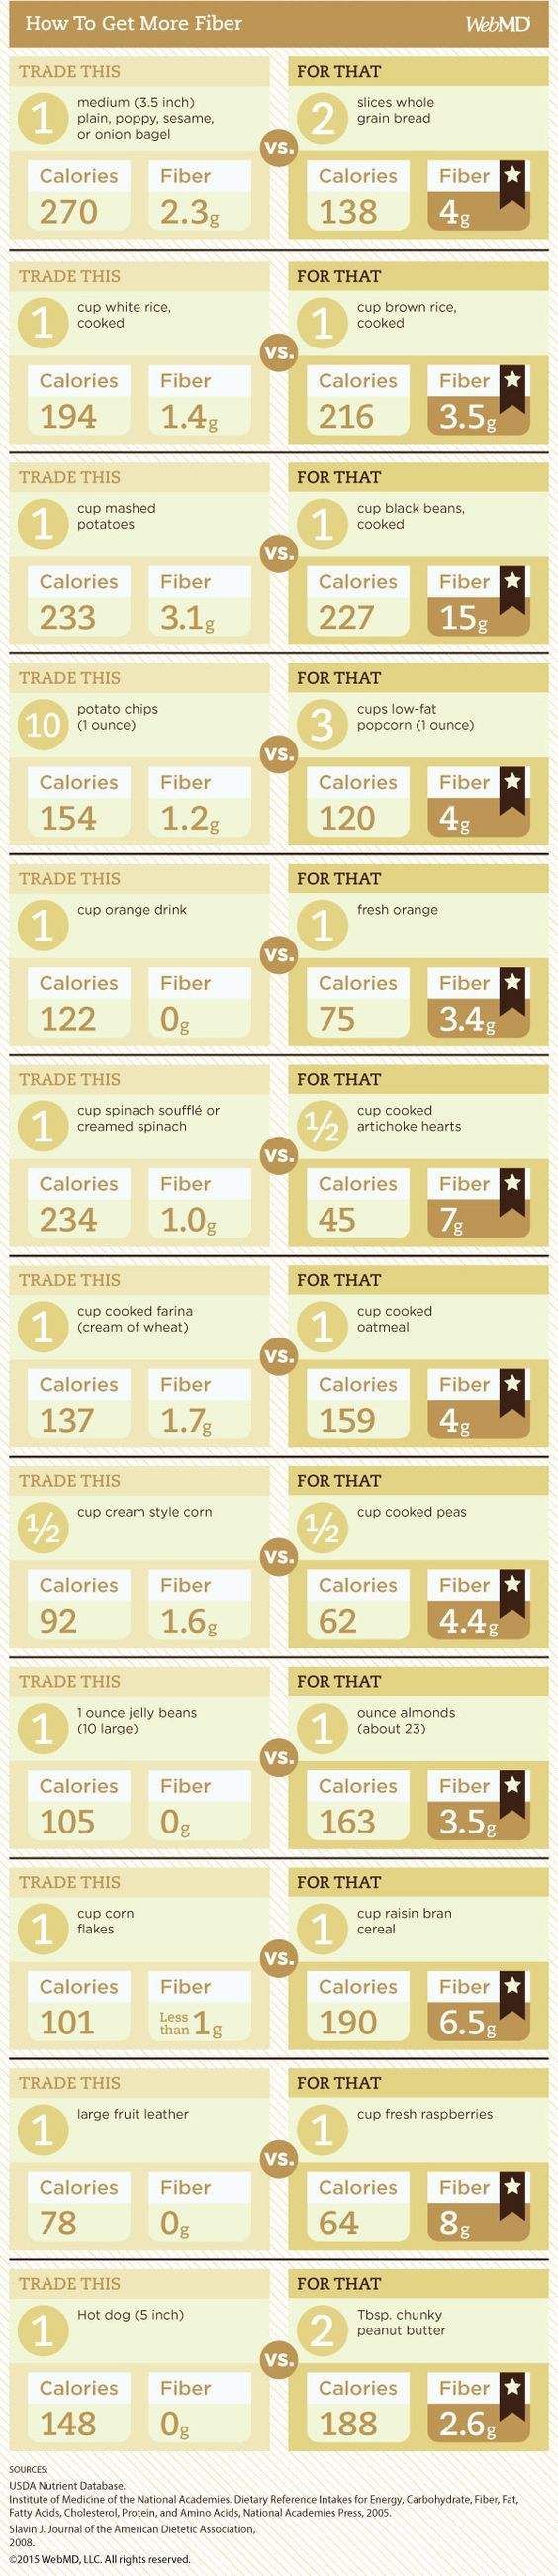 how to get more fibre into diet